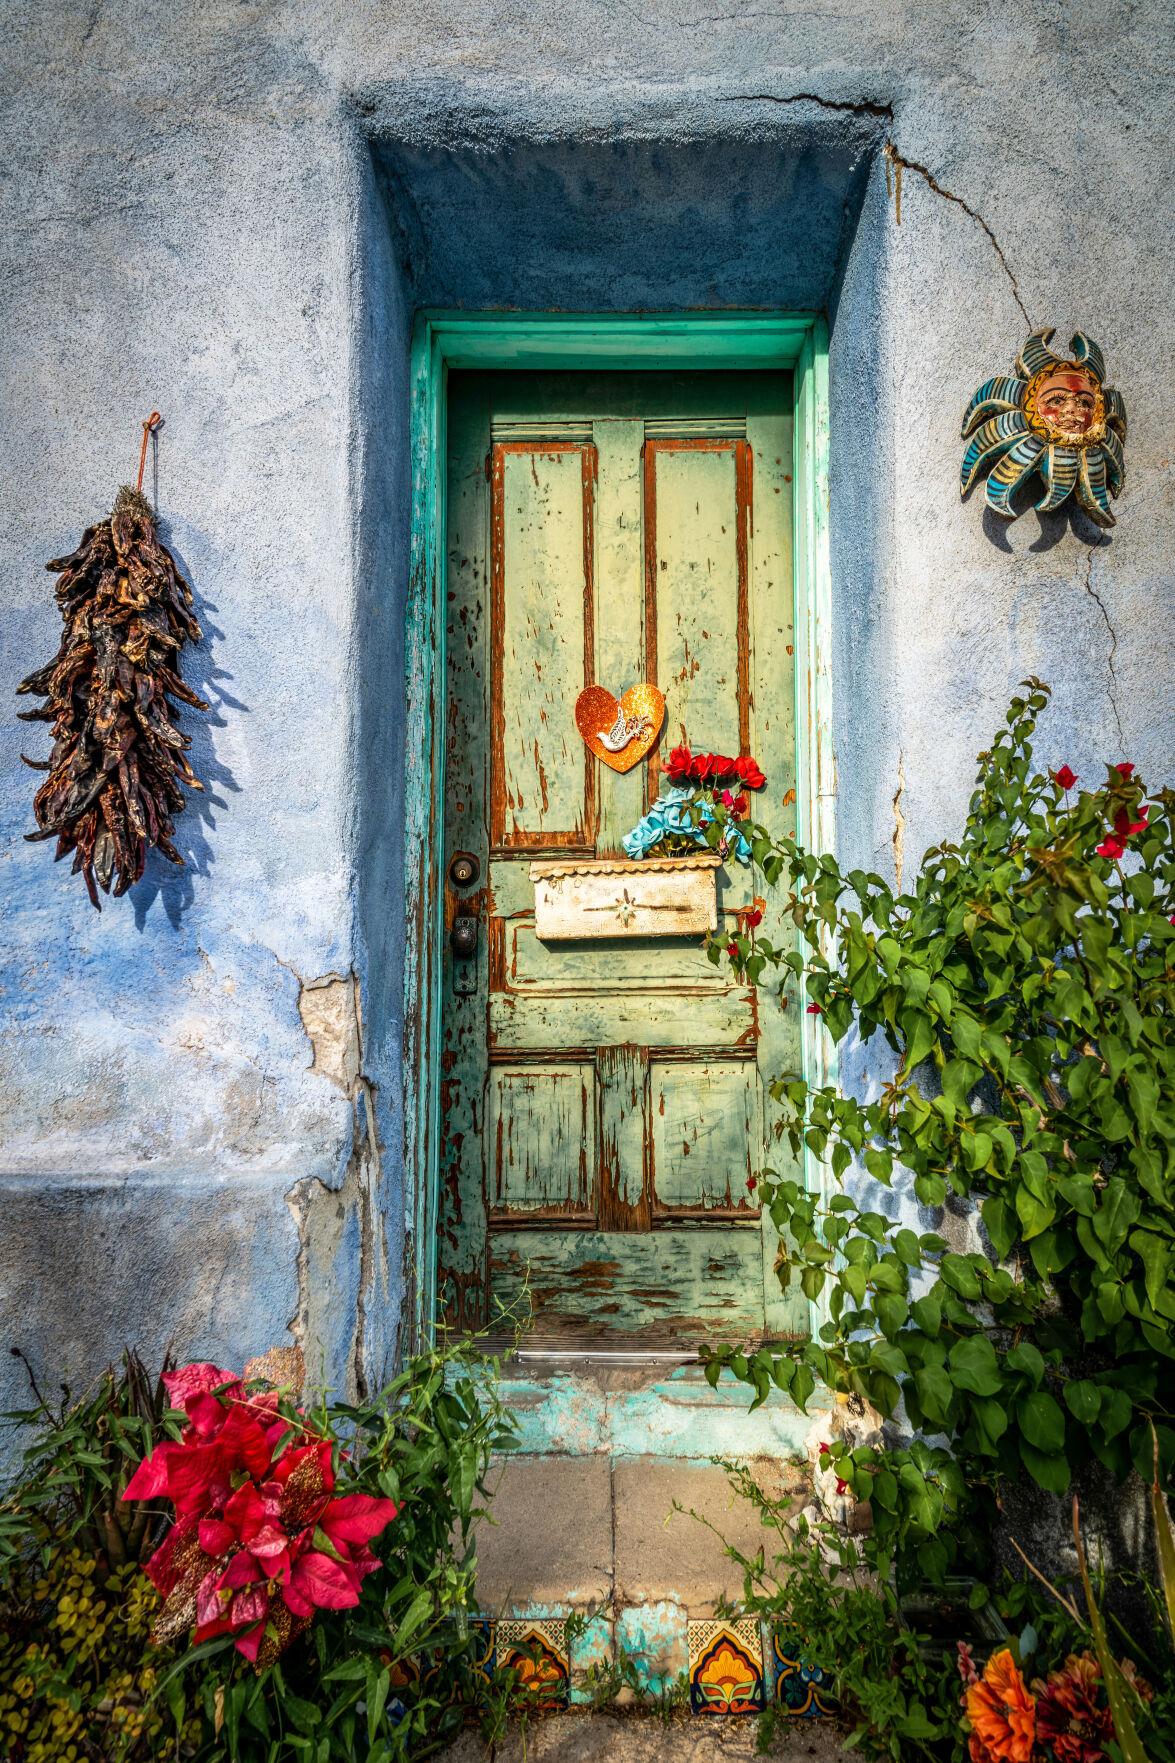 HITH Barrio Viejo by Jon Linton